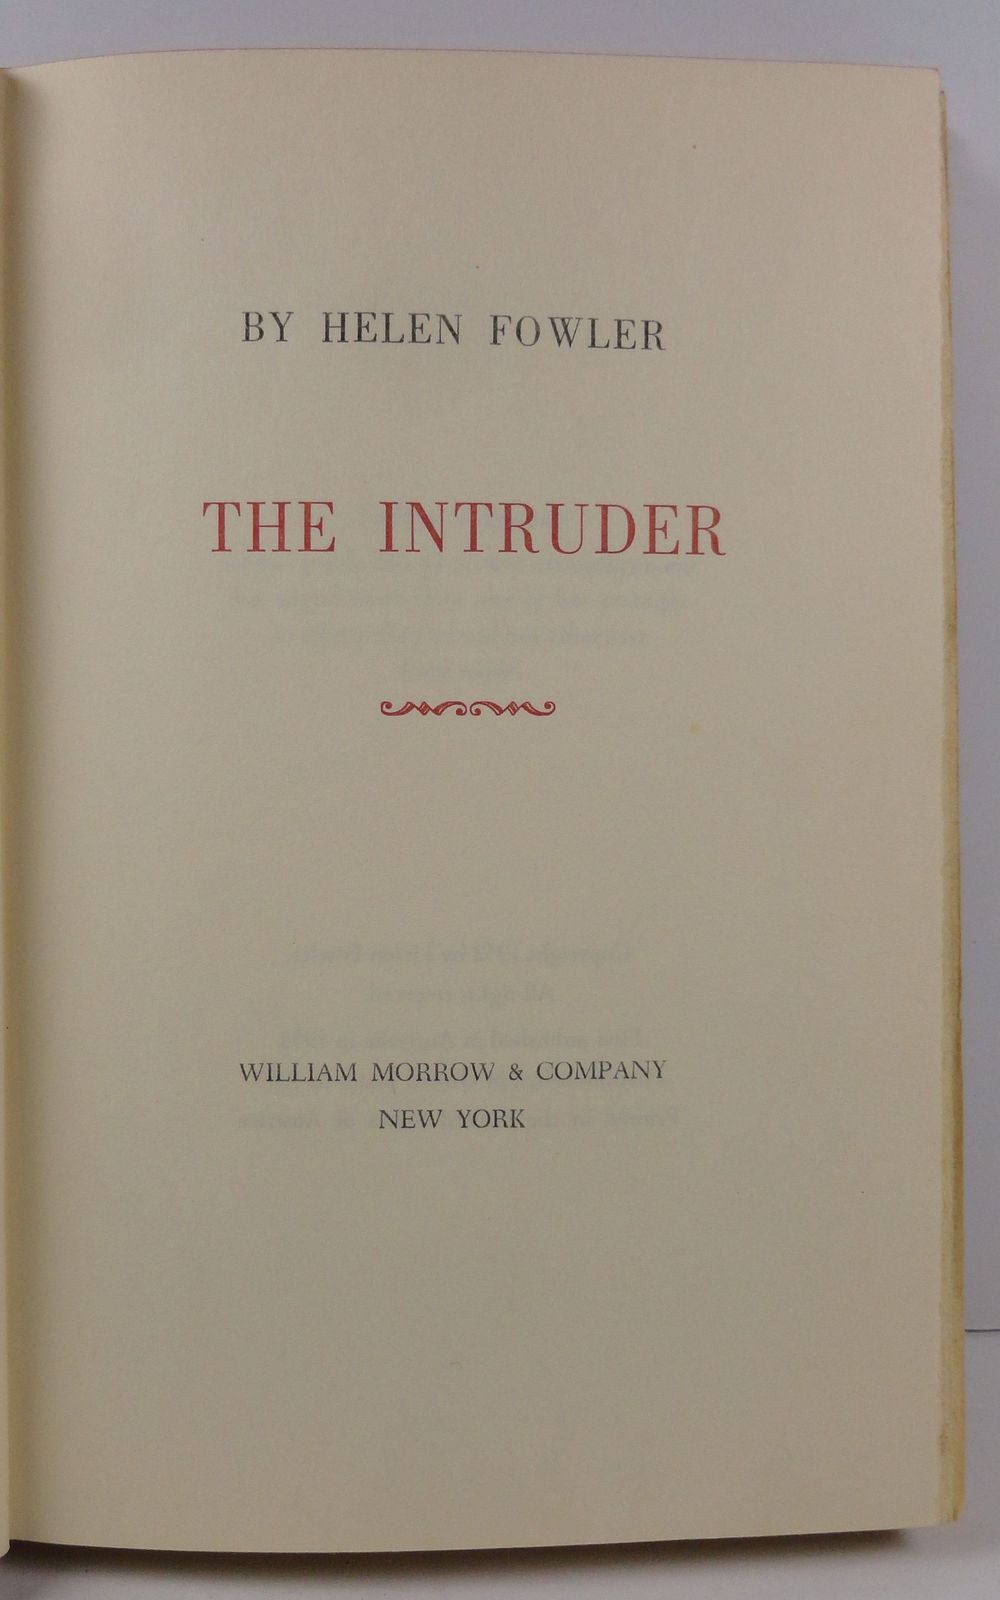 The Intruder by Helen Fowler 1953